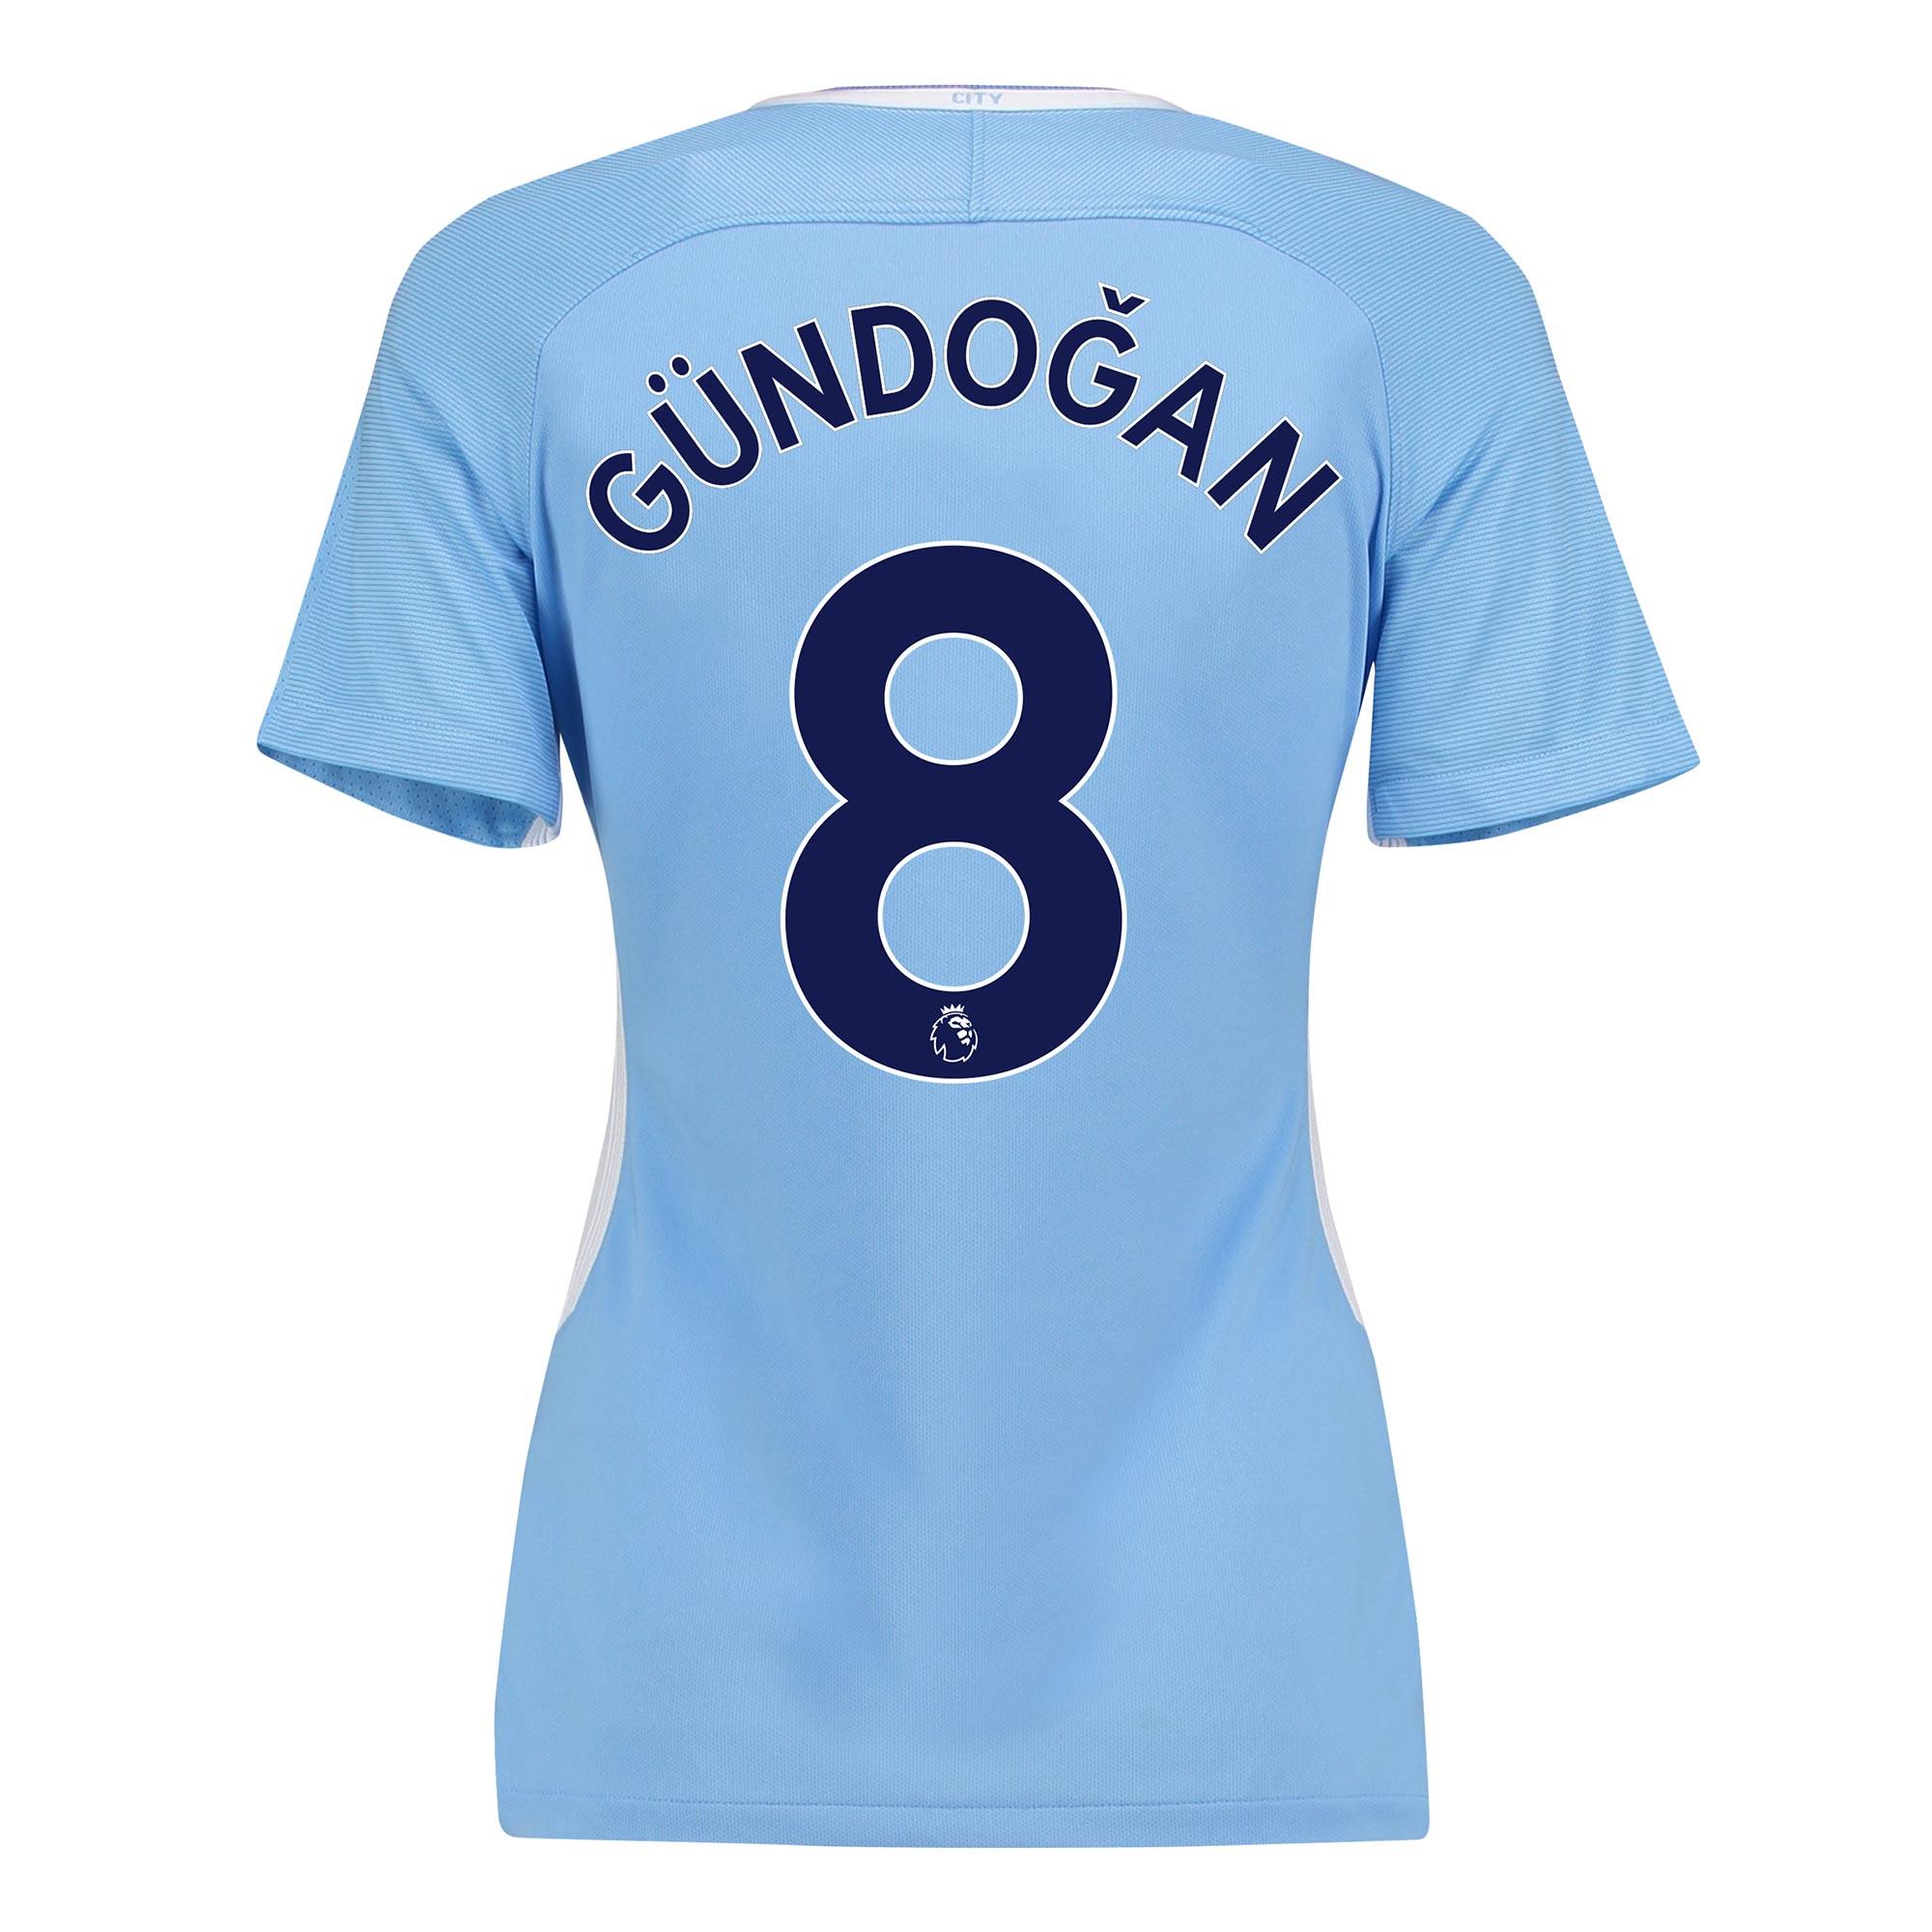 Manchester City Home Stadium Shirt 2017-18 - Womens with Gündogan 8 pr